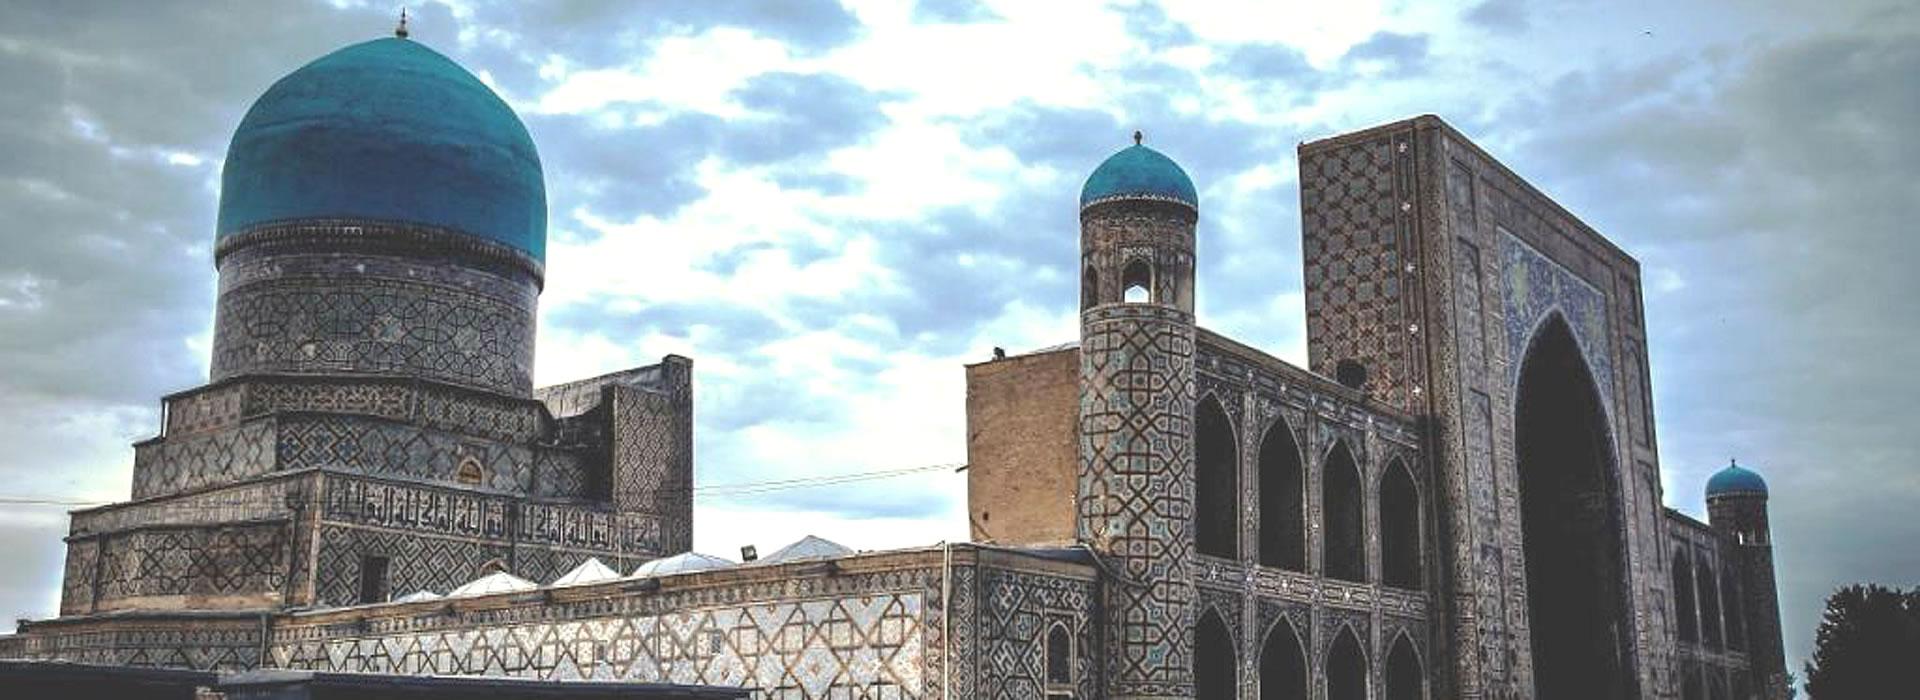 pic-banner-usbekistan-2019-03